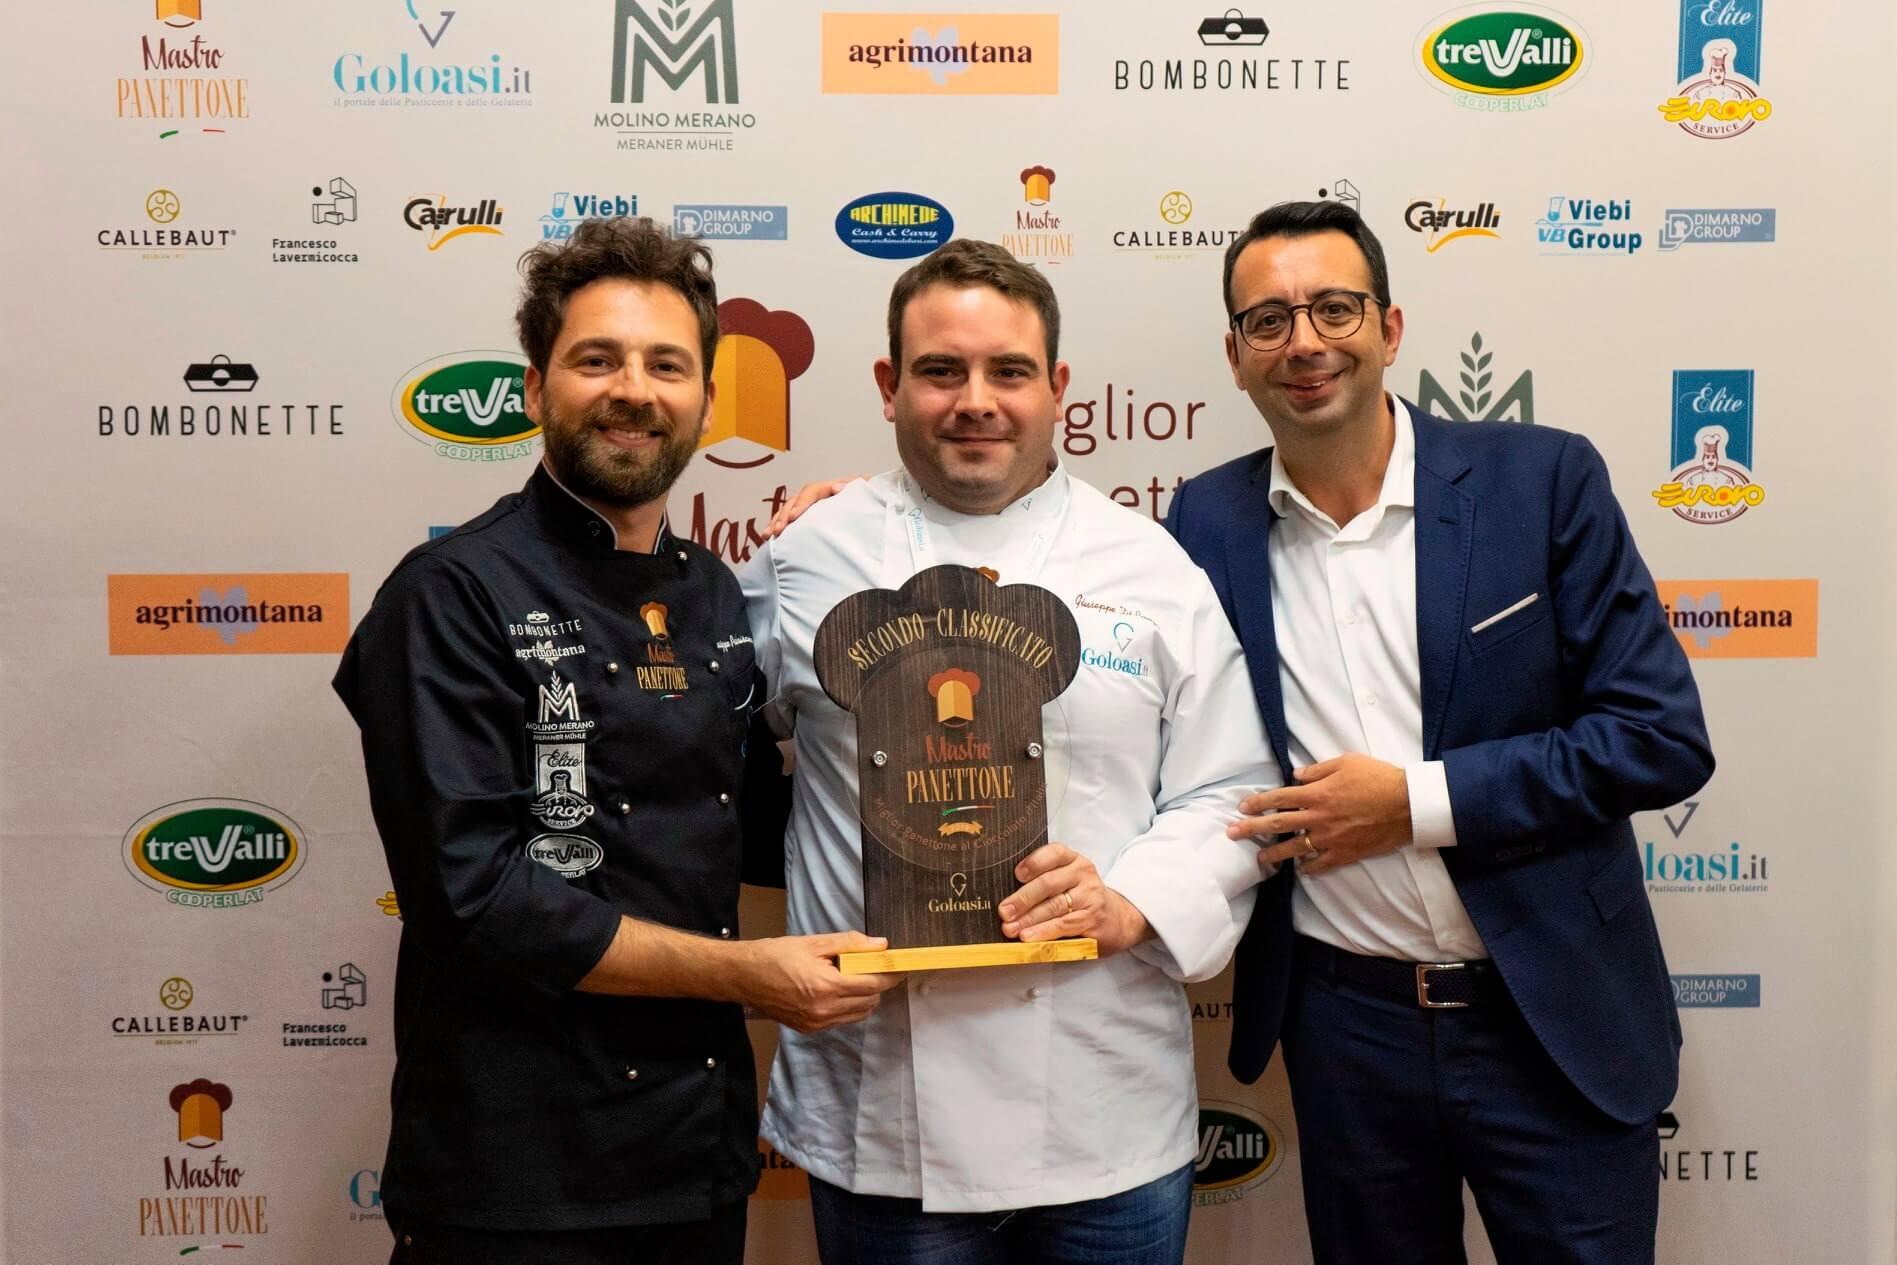 Mastro Panettone 2019 - Goloasi - Dolceria Sapone - Eustachio Sapone 2